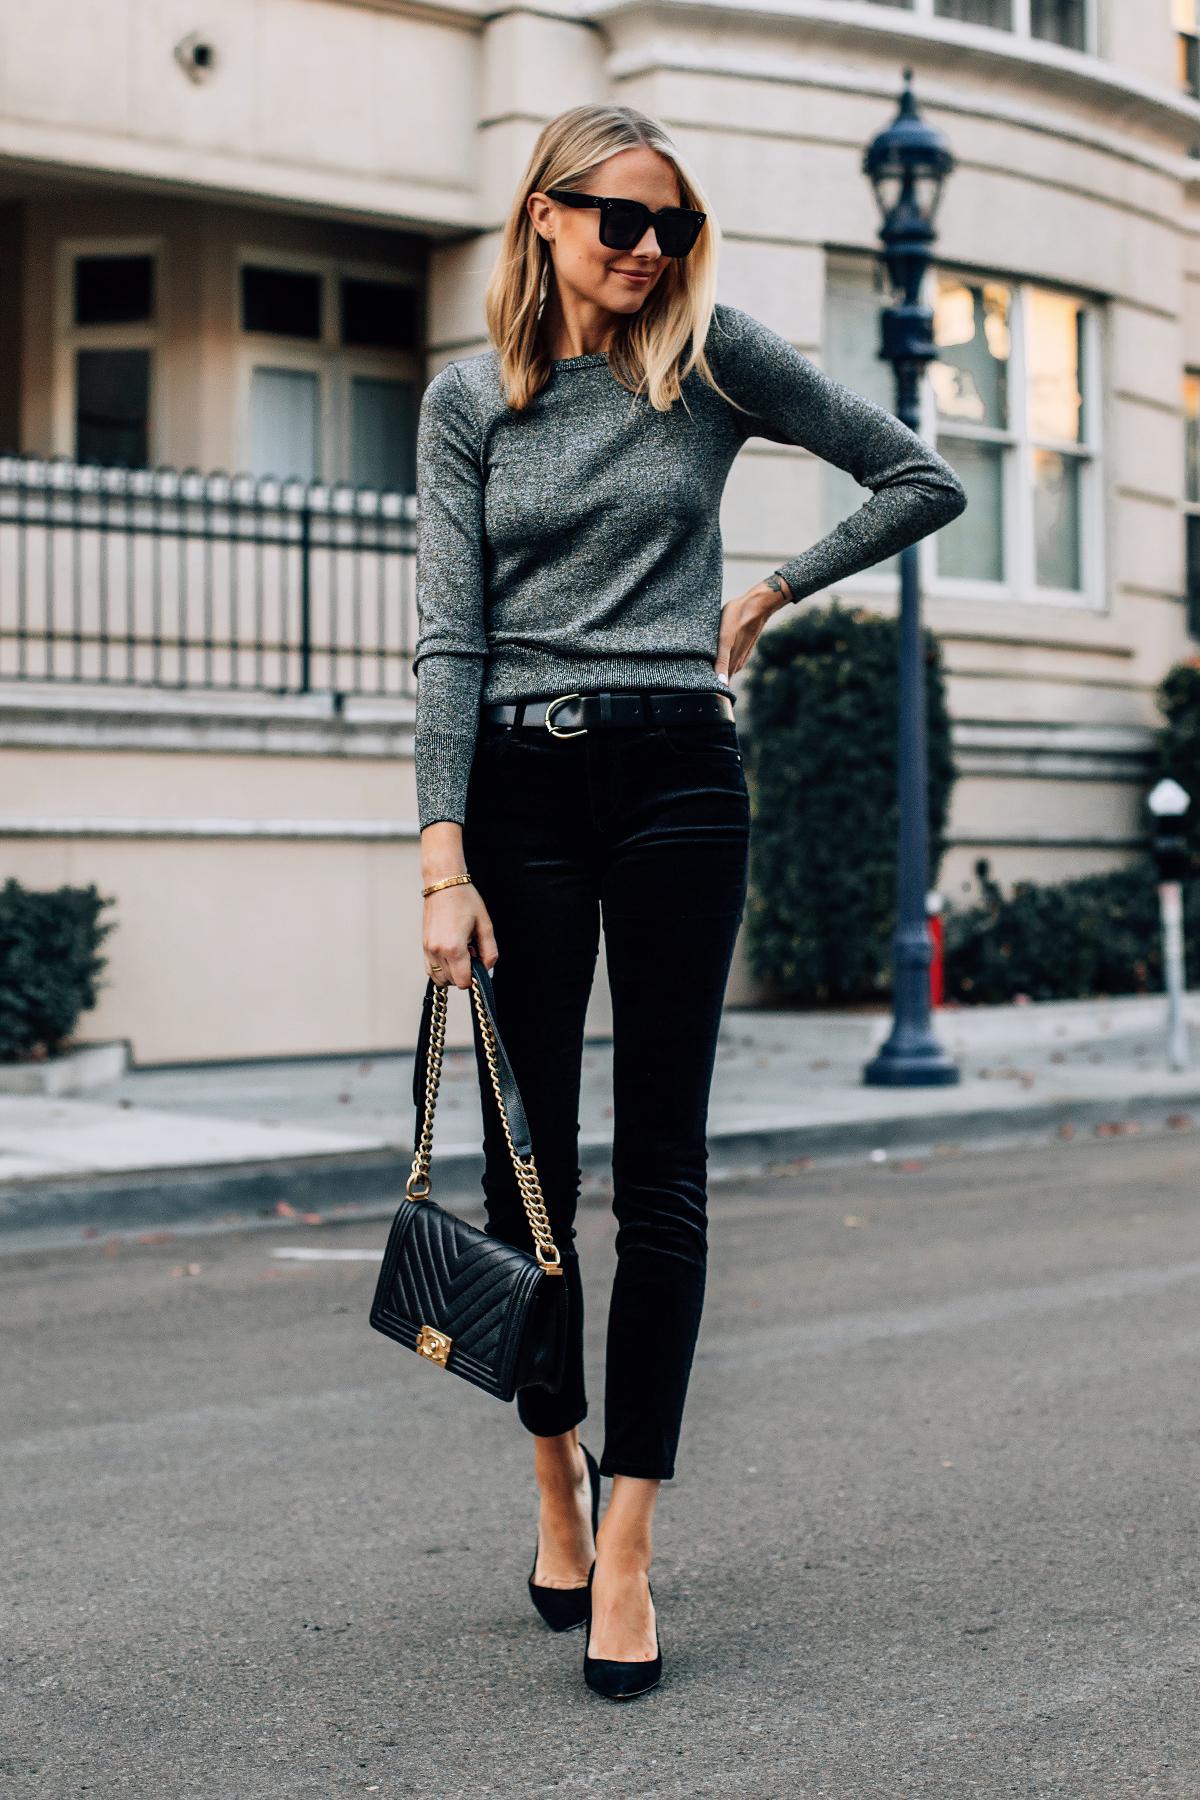 Blonde Woman Wearing Metallic Sweater Black Velvet Jeans Black Pumps Chanel Black Boy Bag Fashion Jackson San Diego Fashion Blogger Street Style